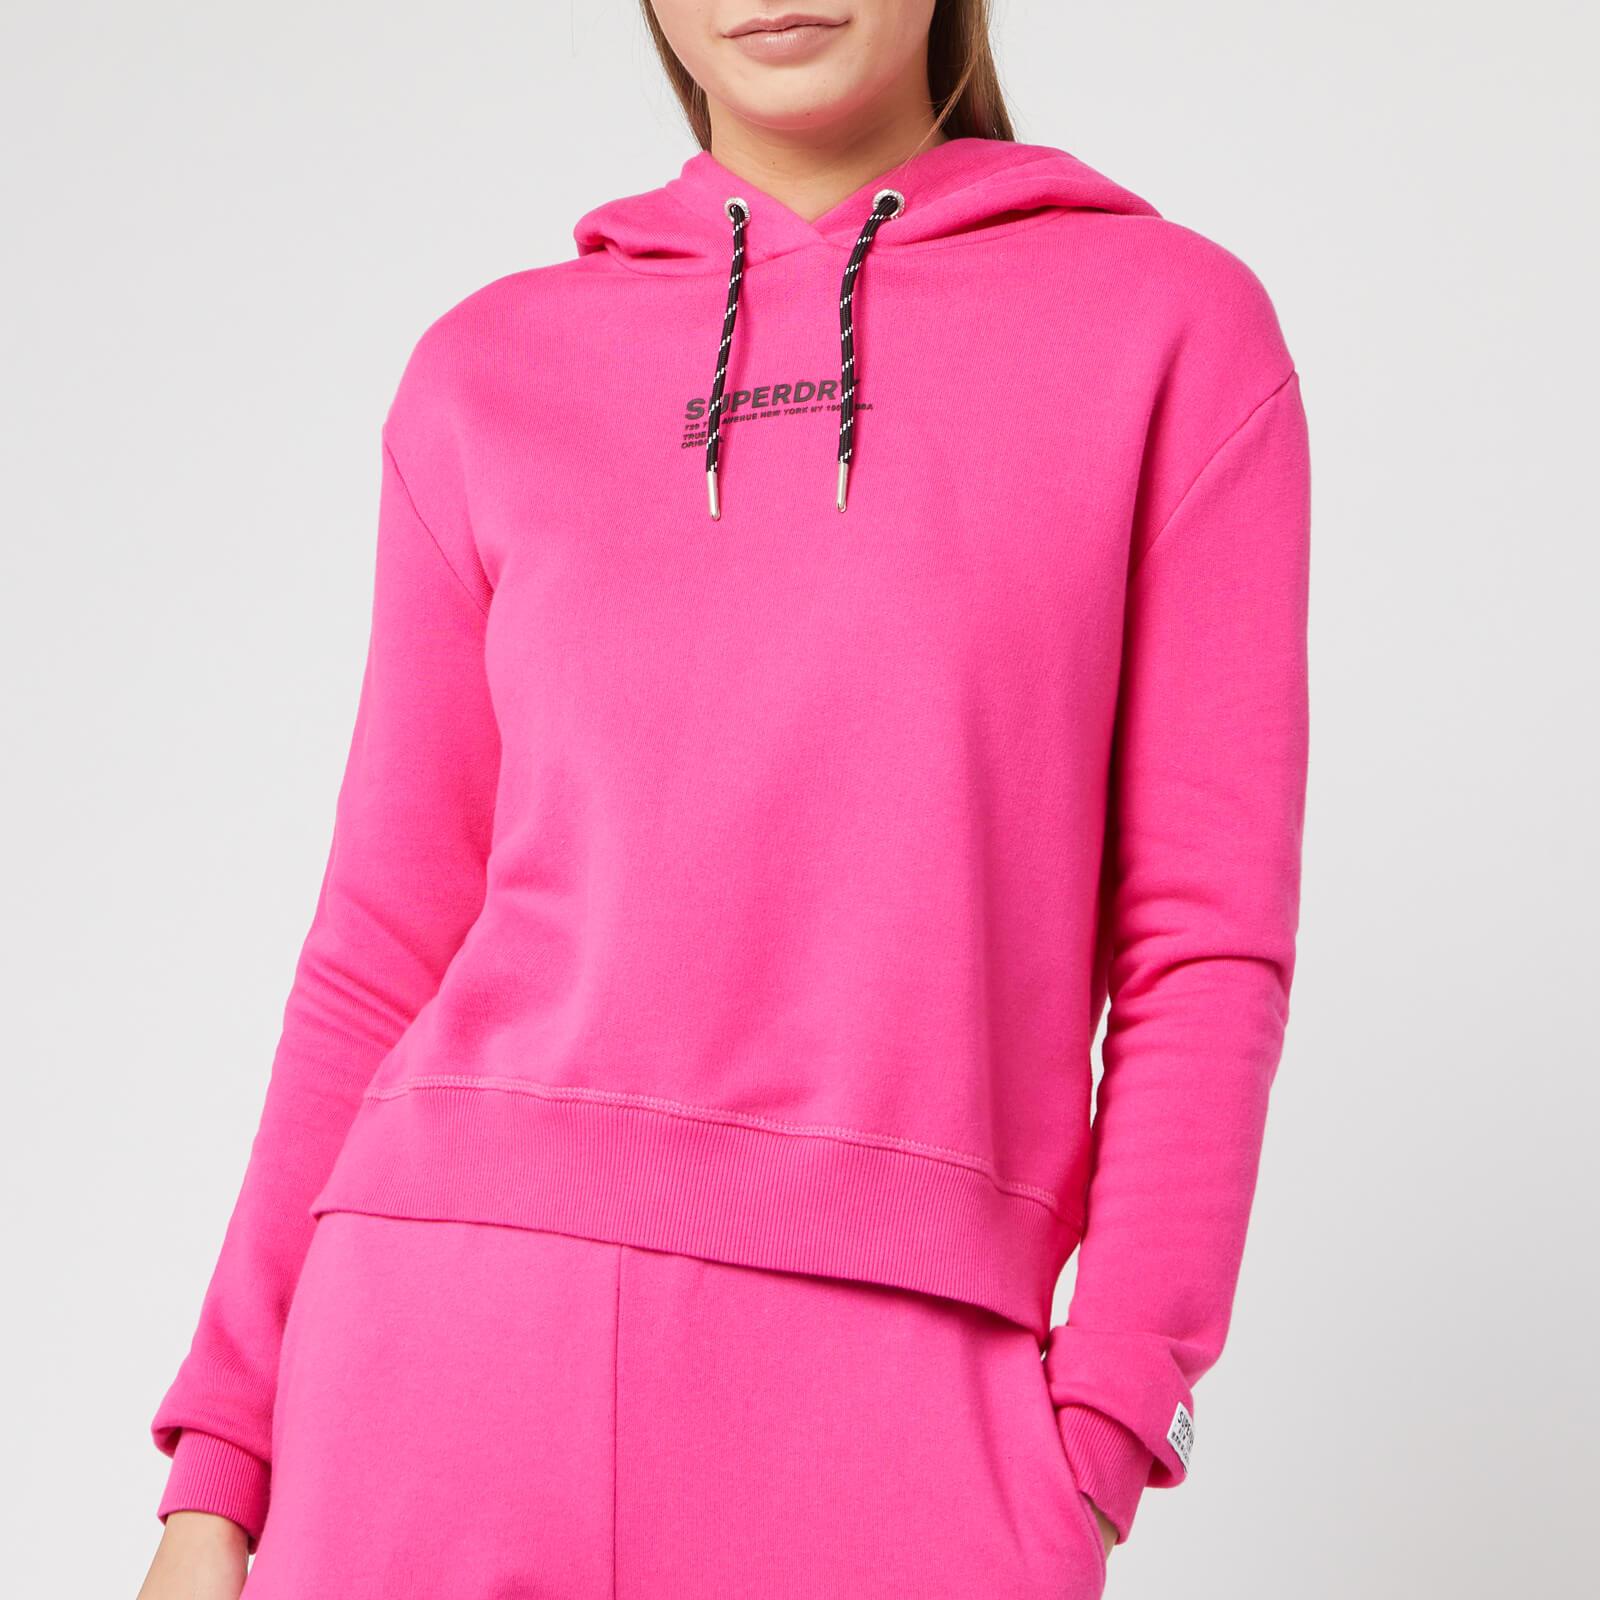 Superdry Women's Elissa Cropped Hoodie Sienna Pink